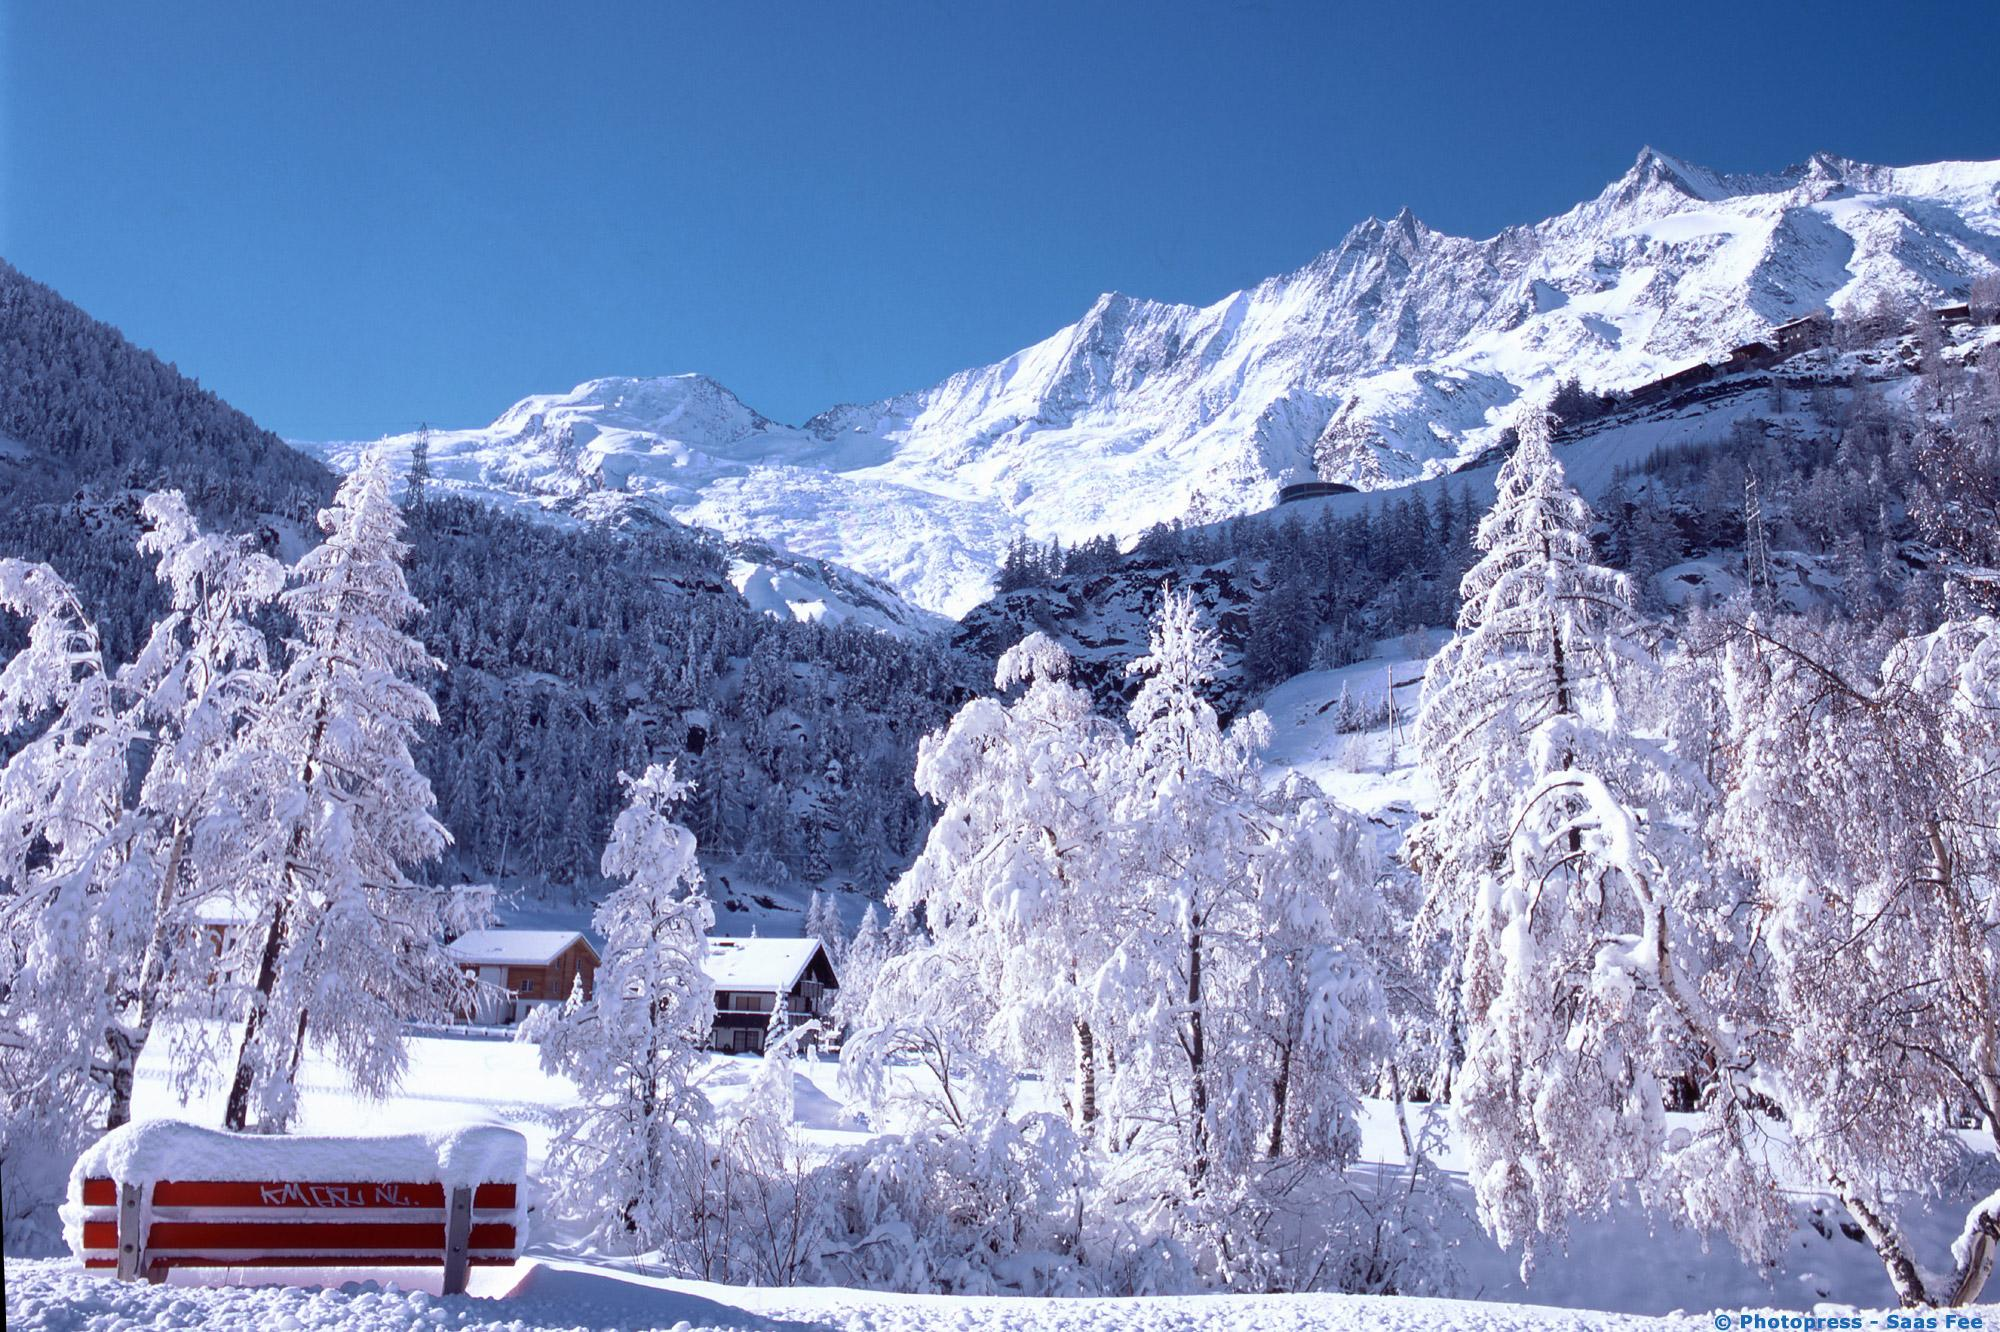 Горнолыжные курорты Швейцарии, отзывы, отели, Церматт, Вербье, Кран-Монтана, Саас-Фе, Давос, Санкт-Мориц